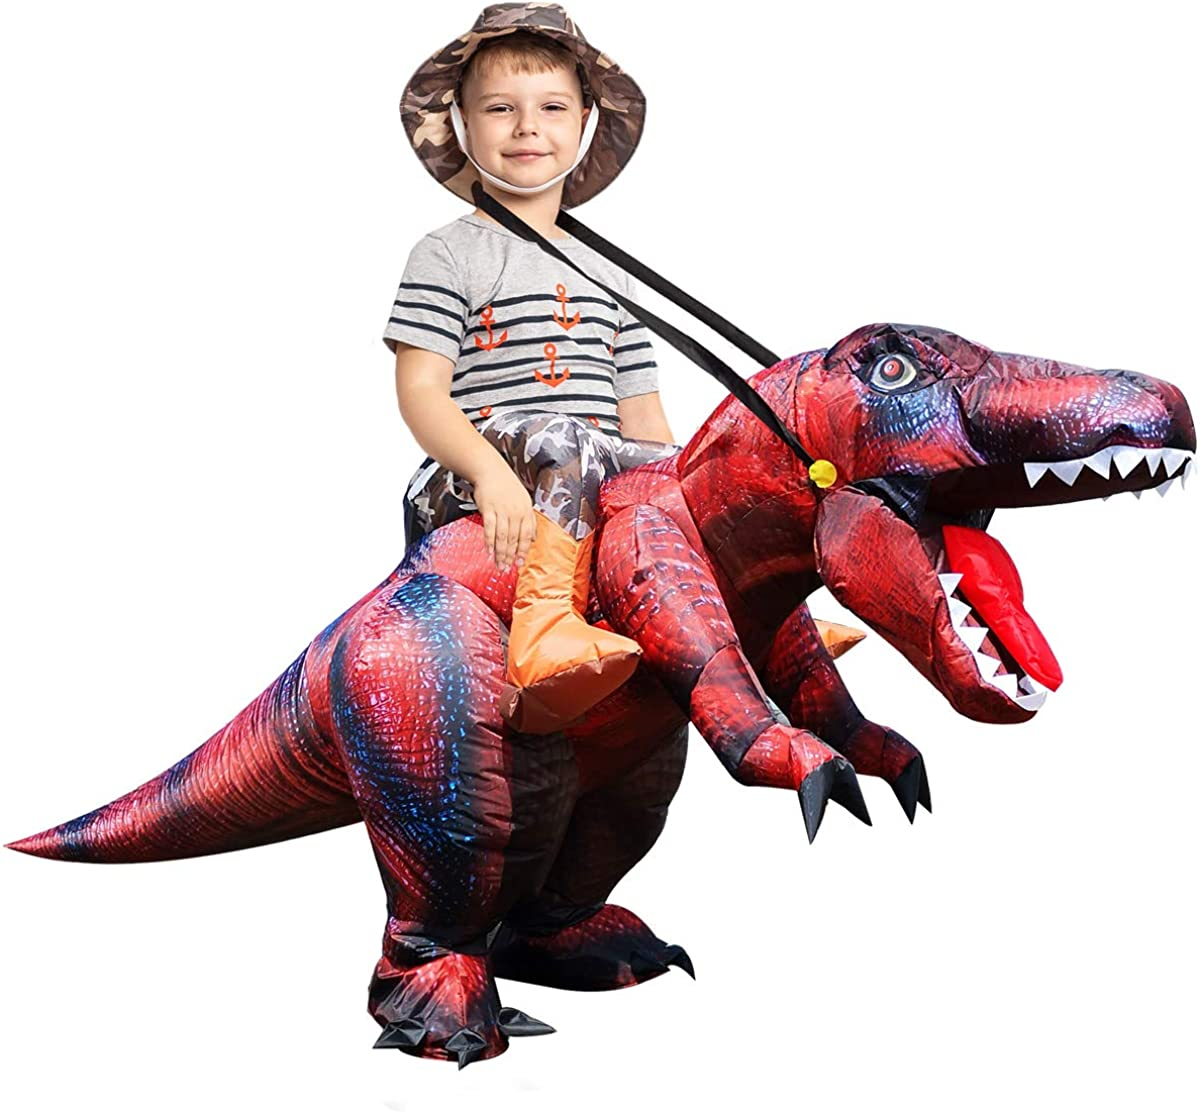 Seasonal Wrap Introduction GOOSH Halloween Inflatable Dinosaur Costume Air Child B for New popularity Tall